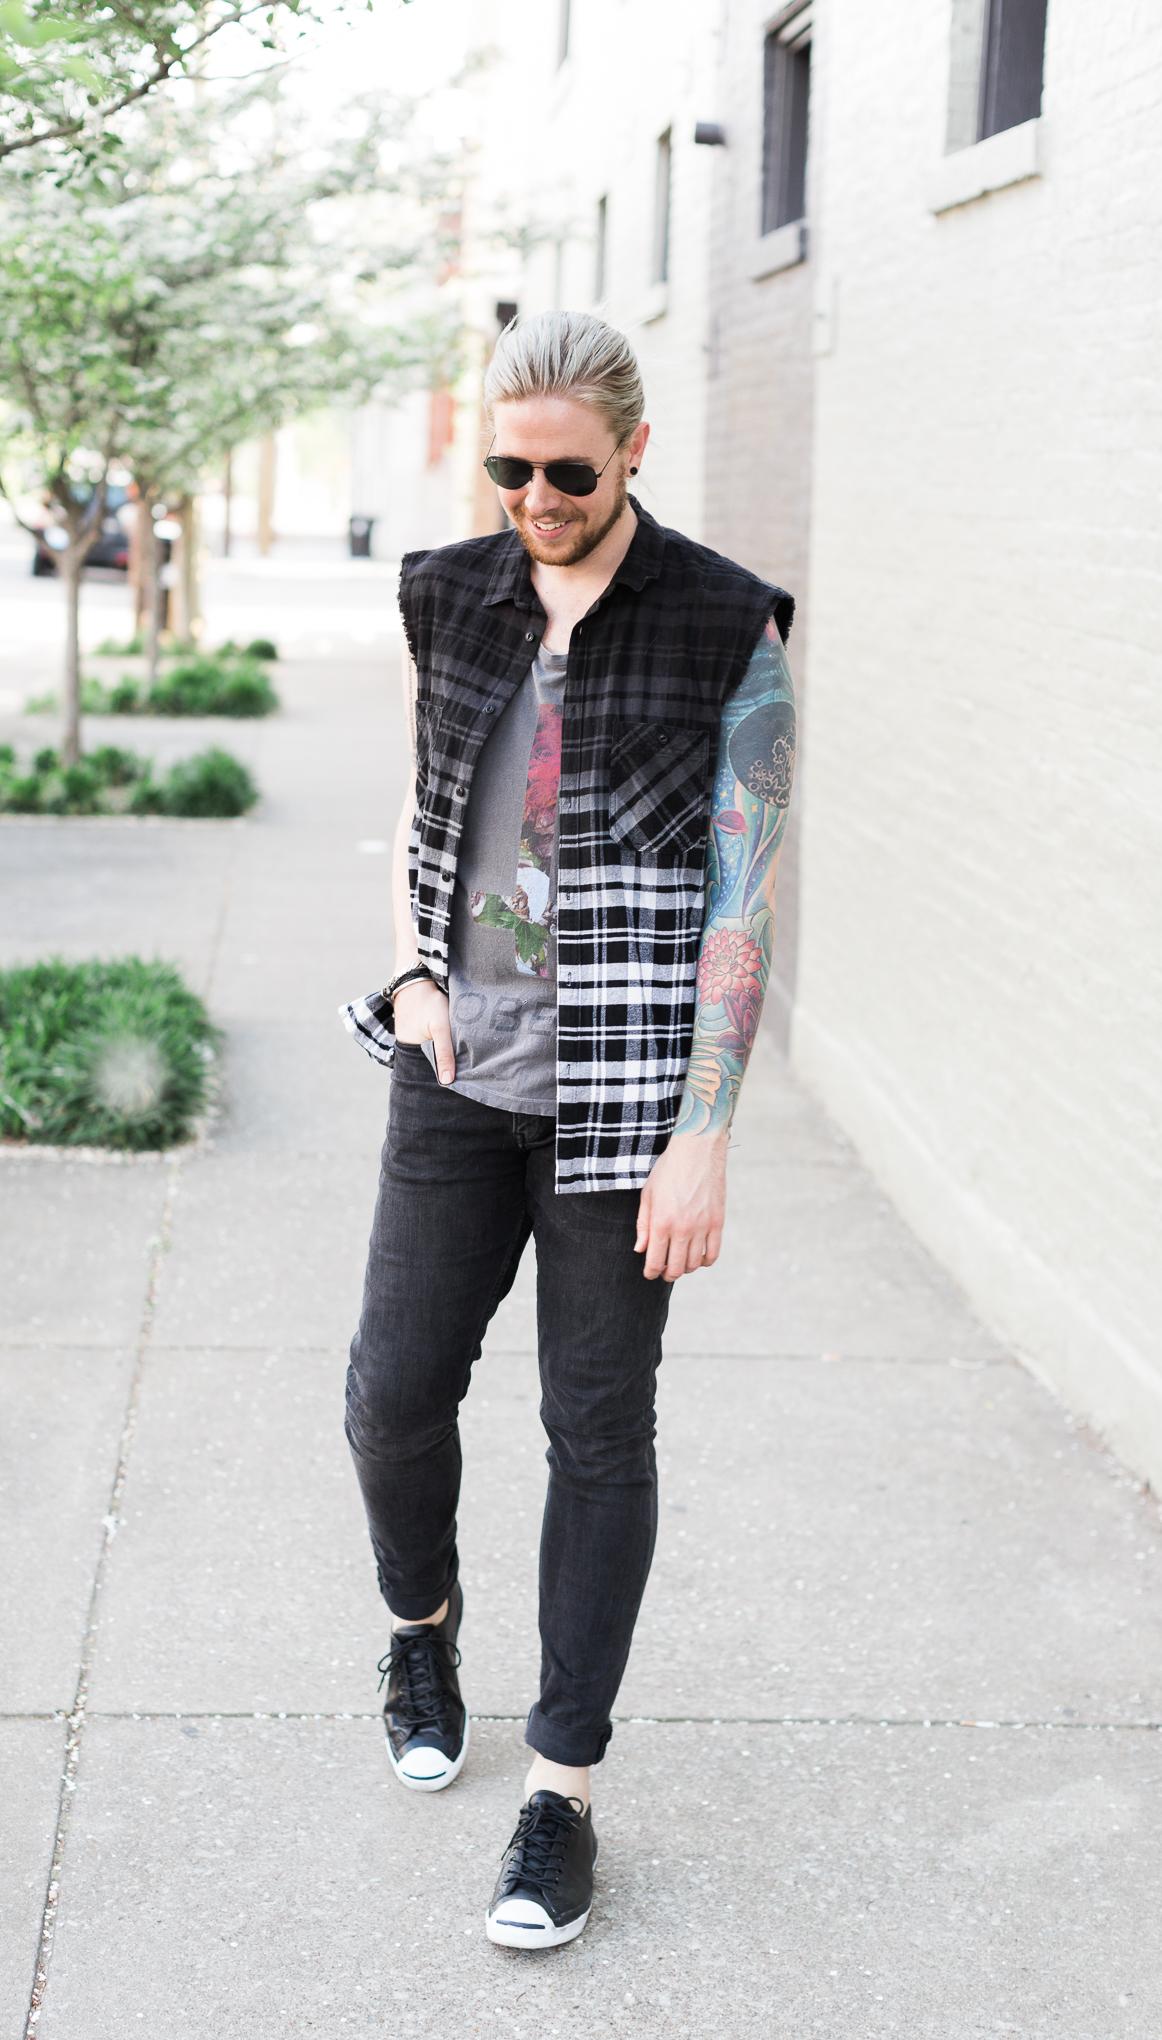 louisville kentucky, hm mens clothing, obey tank top, mens fashion blog, the kentucky gent